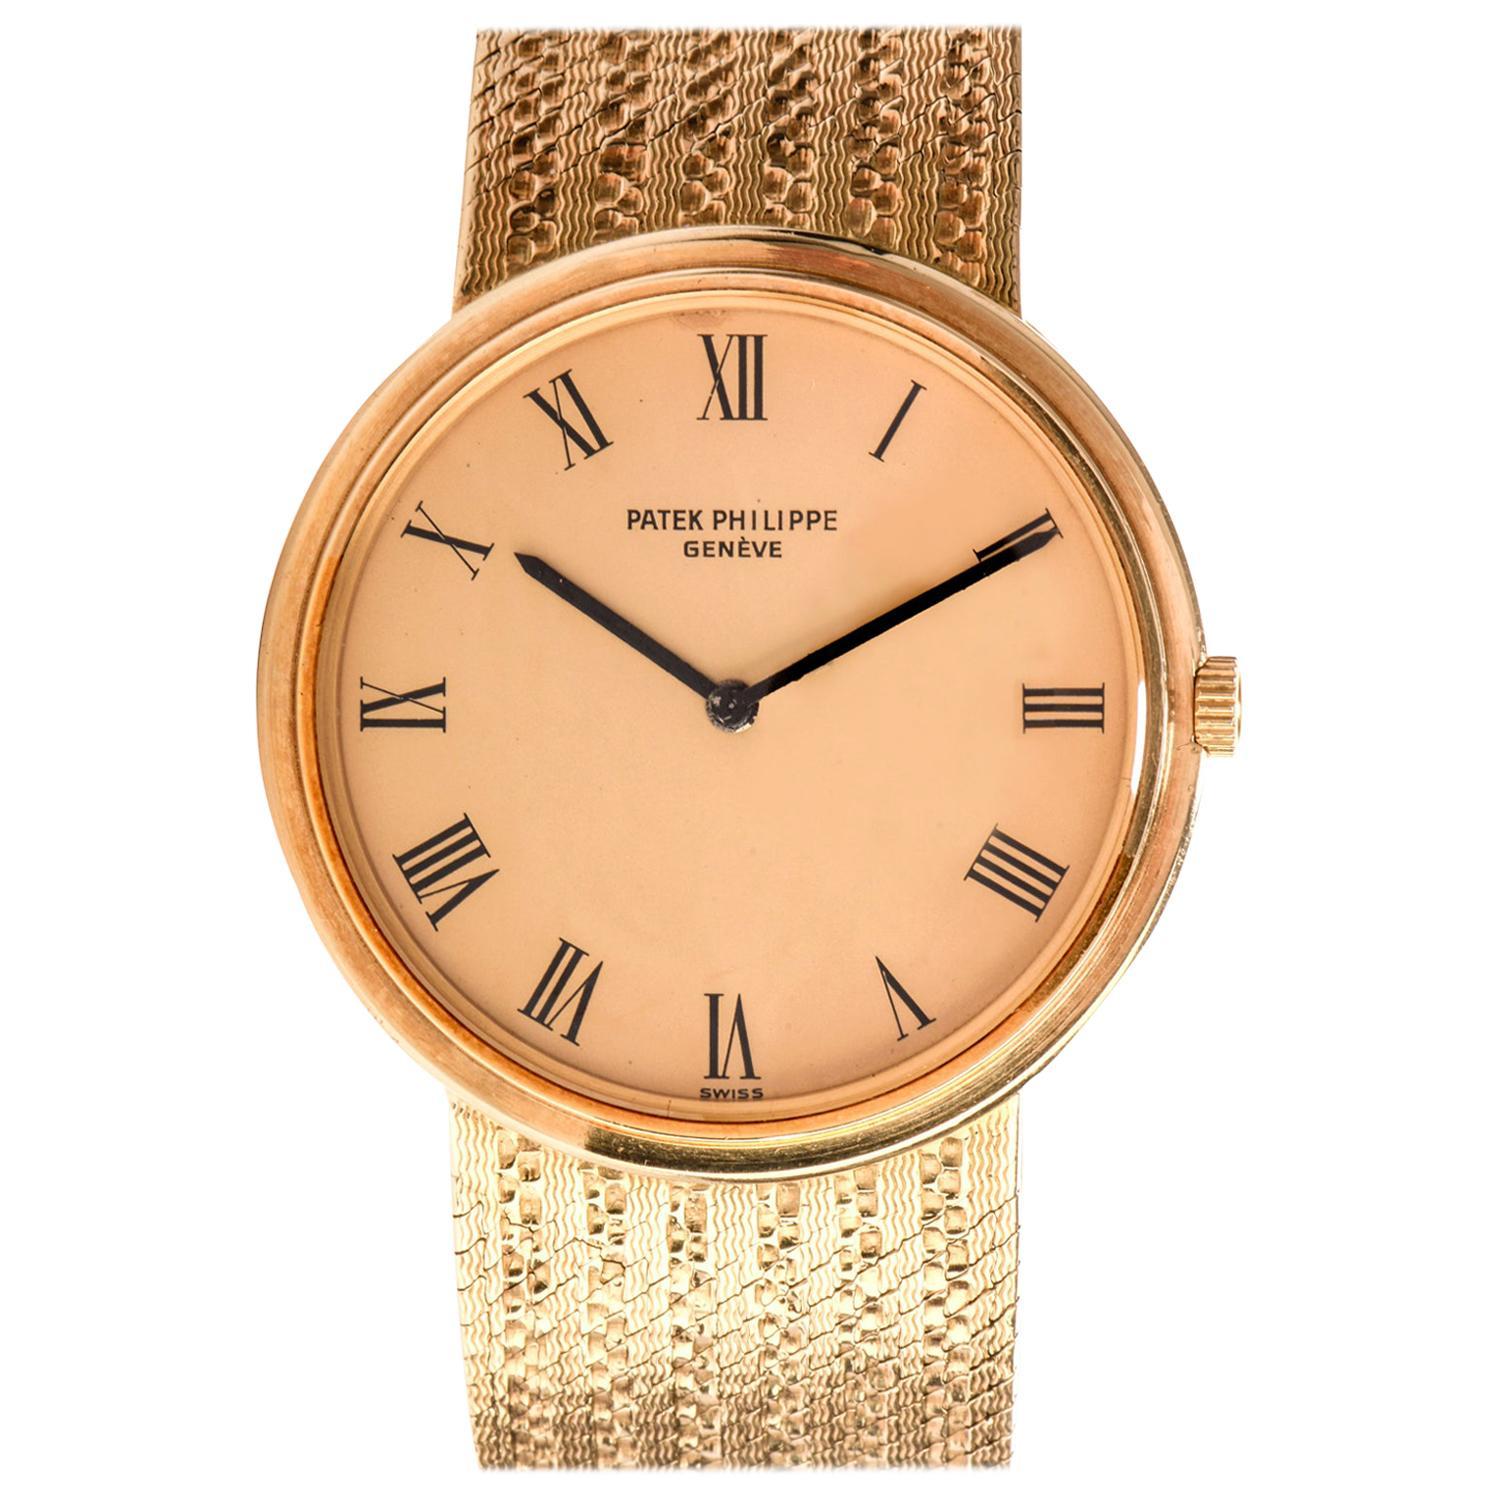 Vinatge Patek Philippe Automatic Calatrava 3591 18 Karat Watch